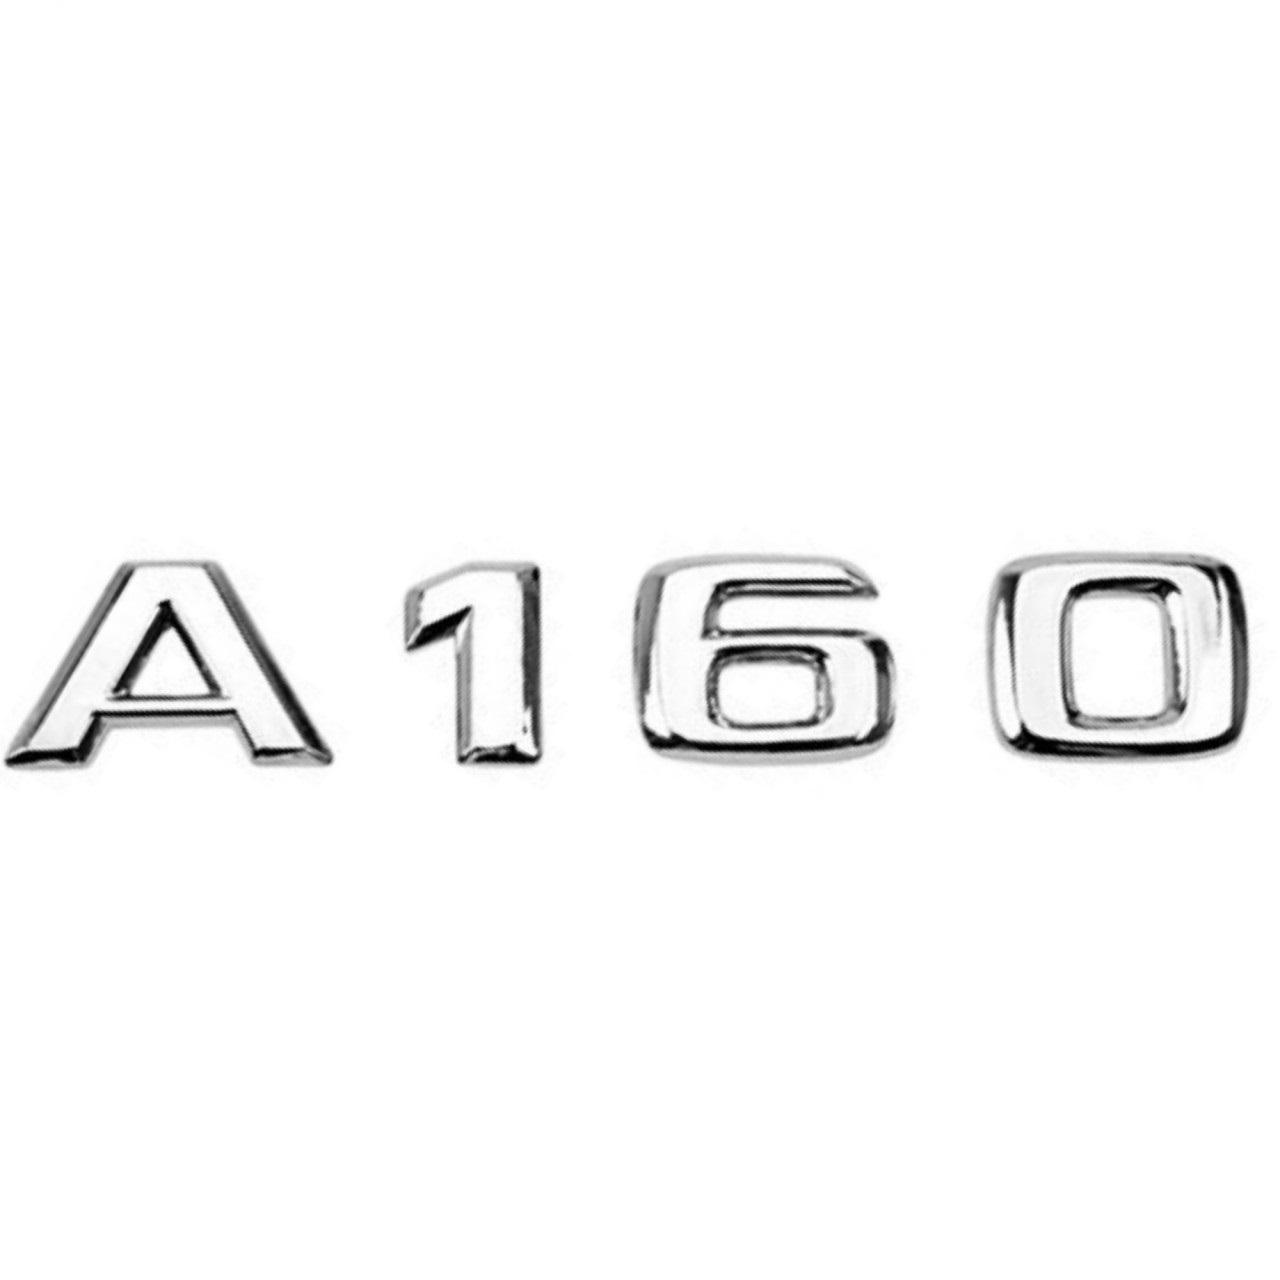 EMB MERCEDES CAFE A-160 (MERC CLASSE A)